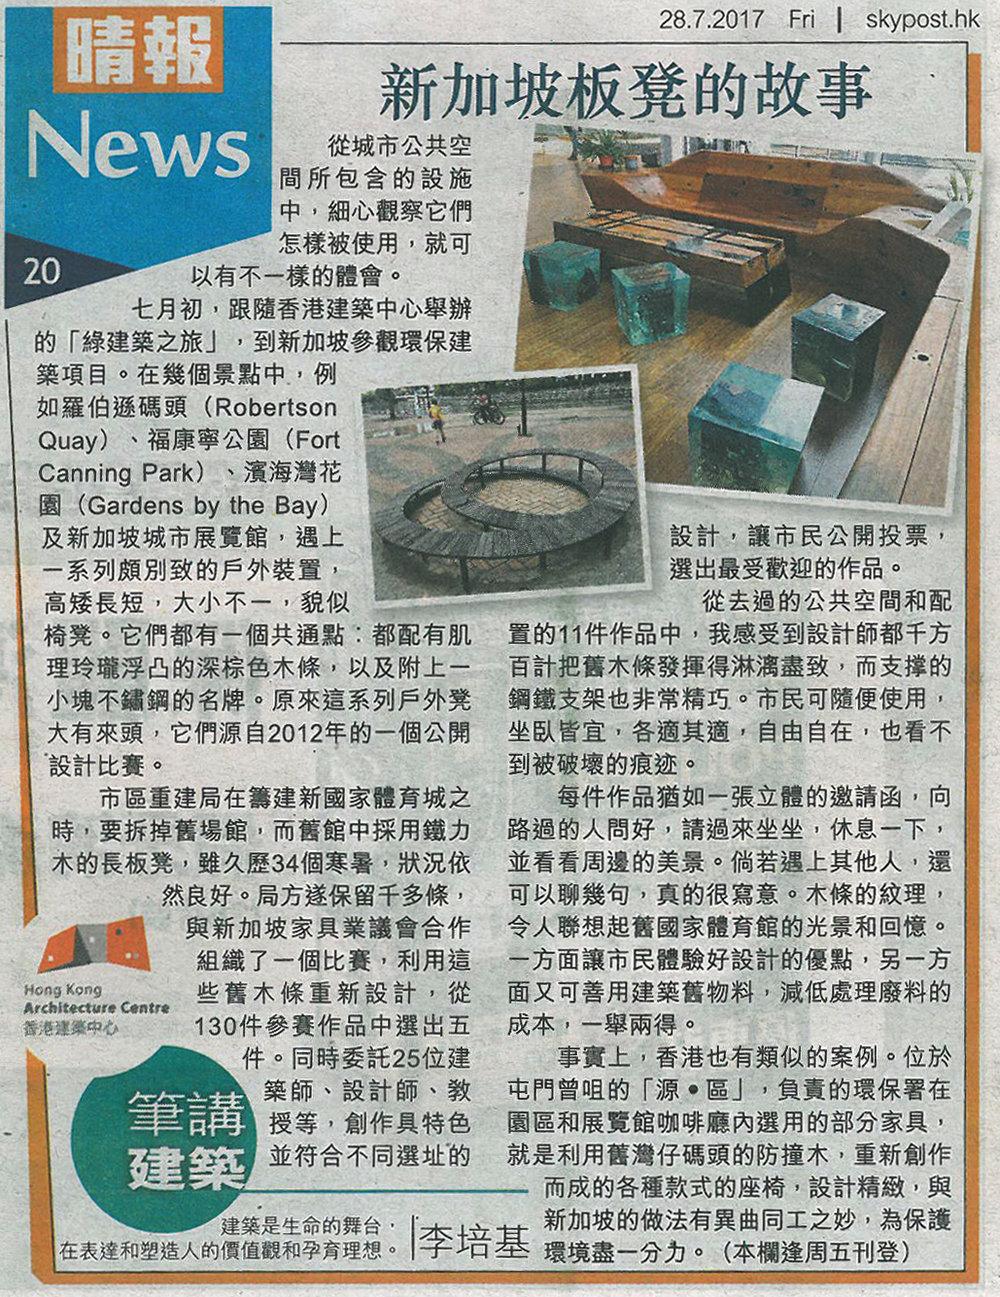 Skypost_170728_李培基_新加坡板凳的故事.jpg